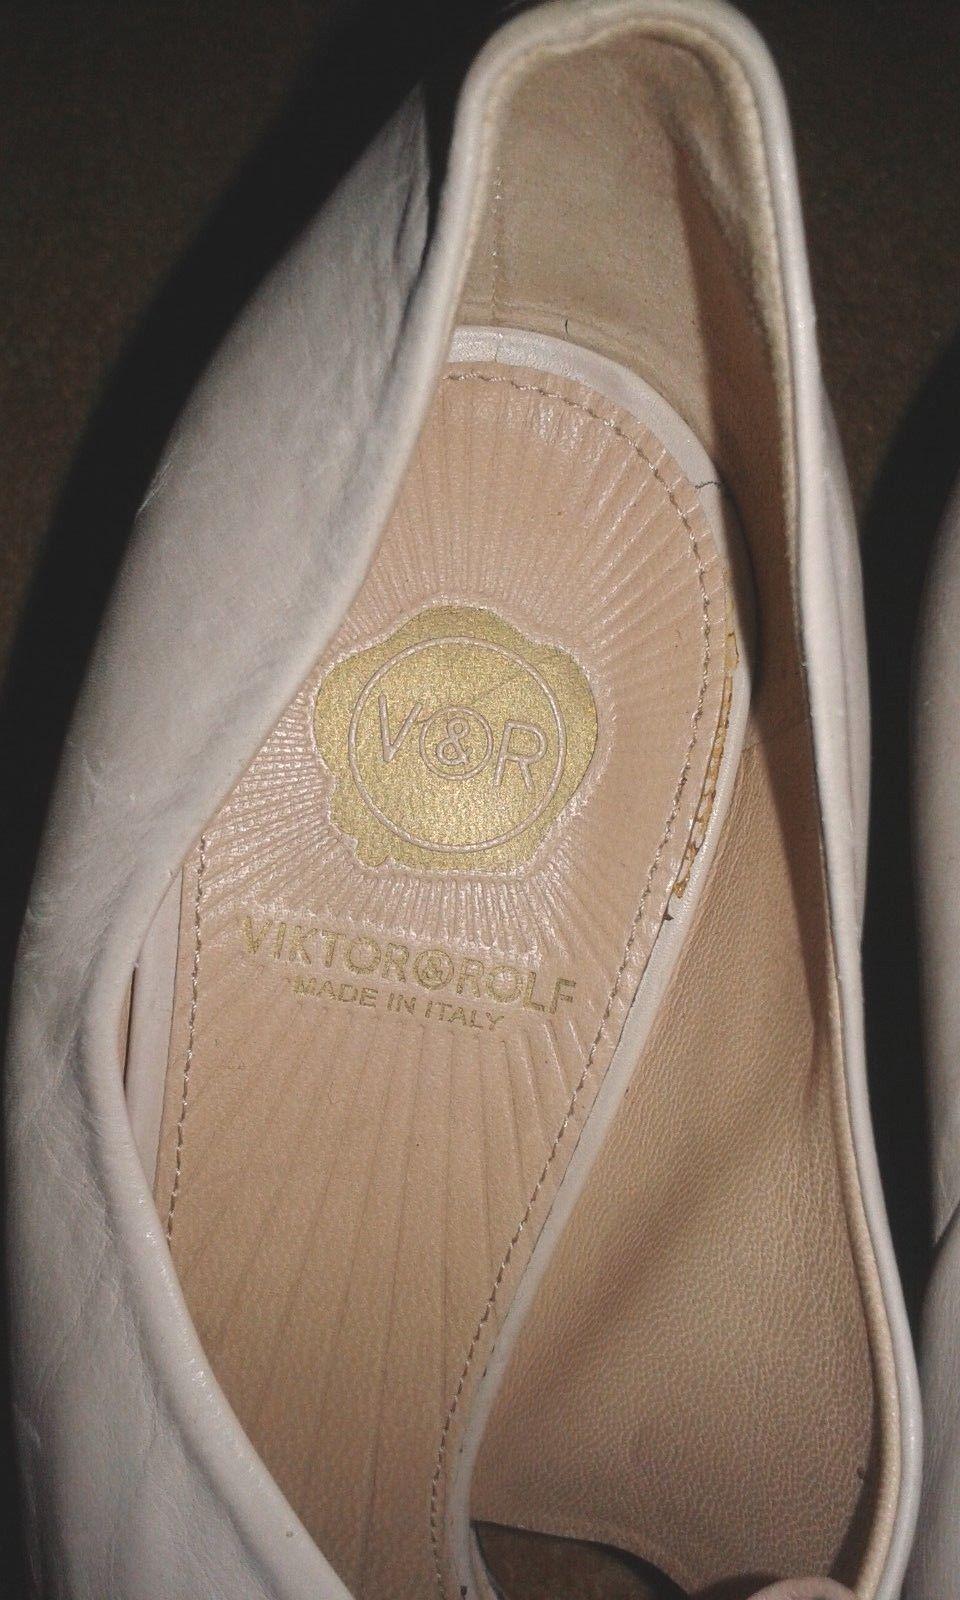 Viktor & Rolf Snakeskin/Nappa Laced Leder Contrast Pointed Toe Laced Snakeskin/Nappa Heels - UK 4 03bf67